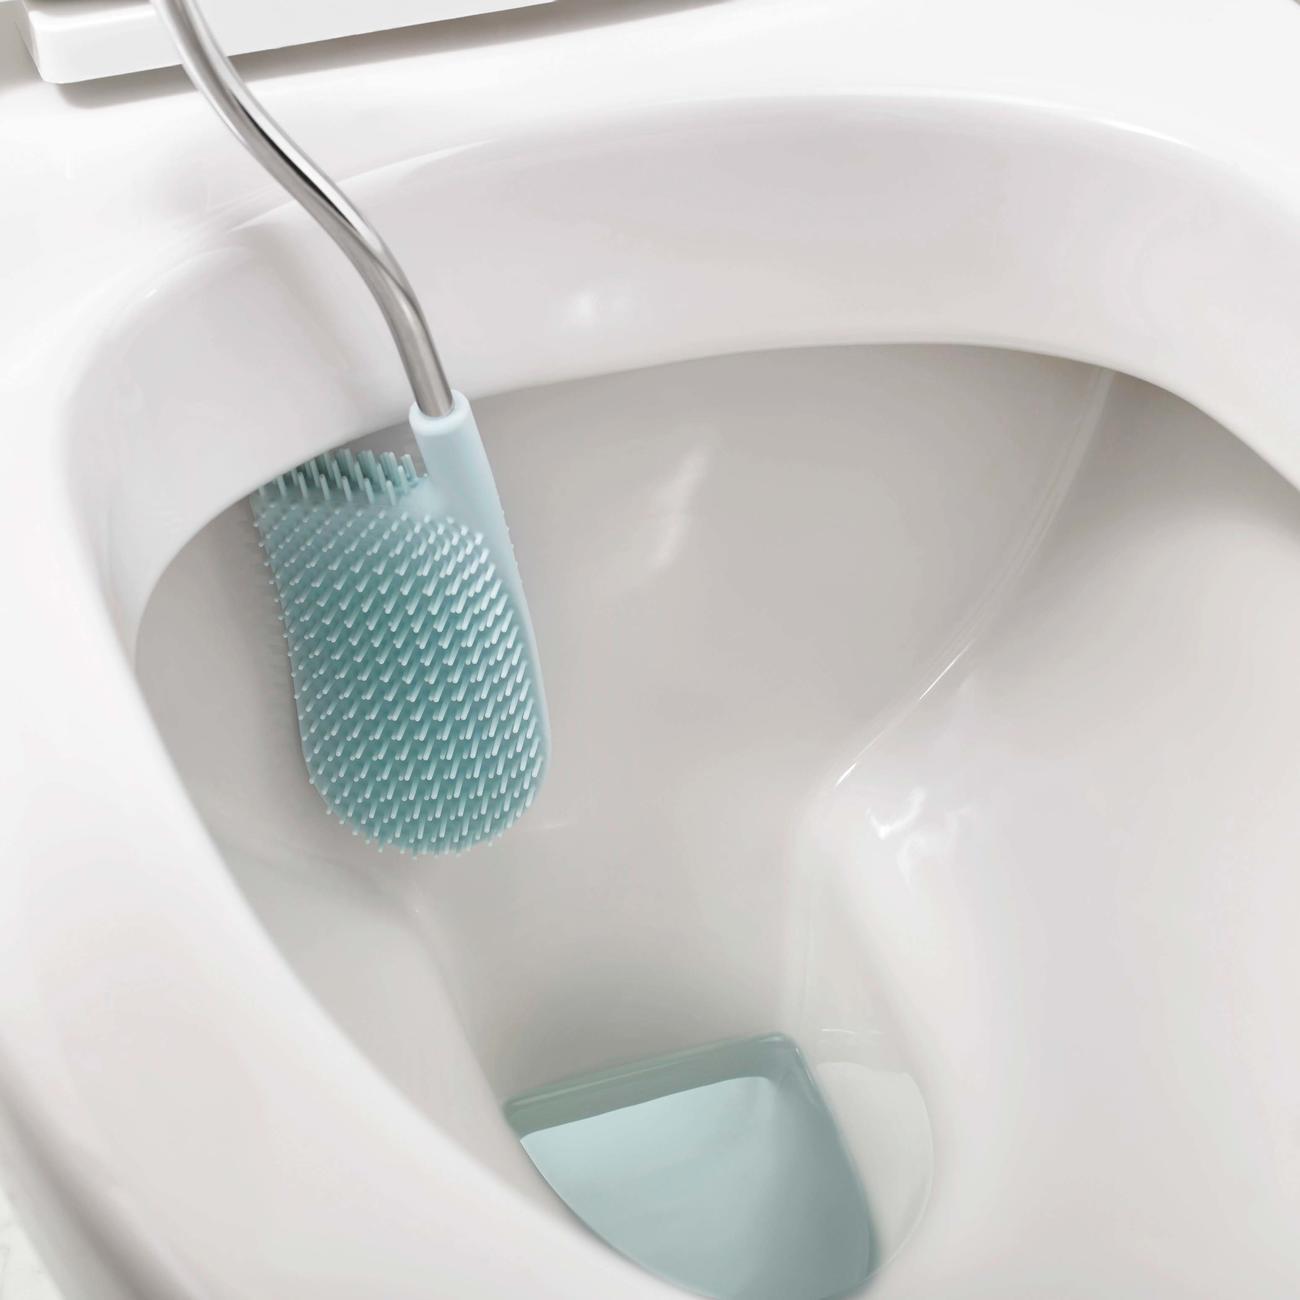 joseph joseph wc b rste toilettenb rste flex smart wei blau. Black Bedroom Furniture Sets. Home Design Ideas